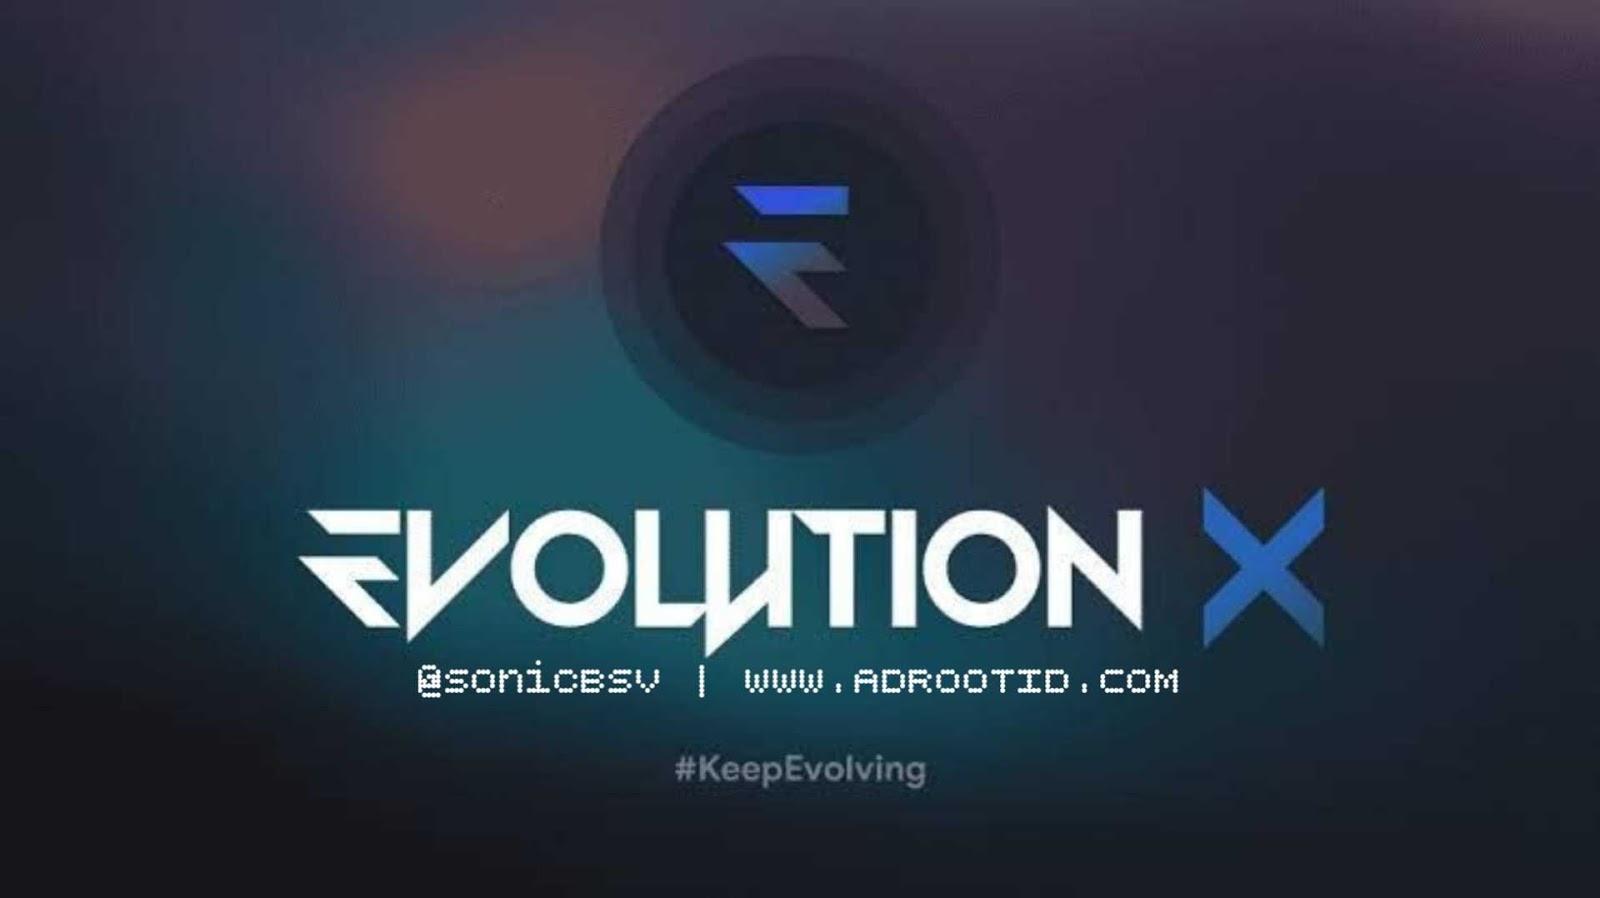 Evolution x rom